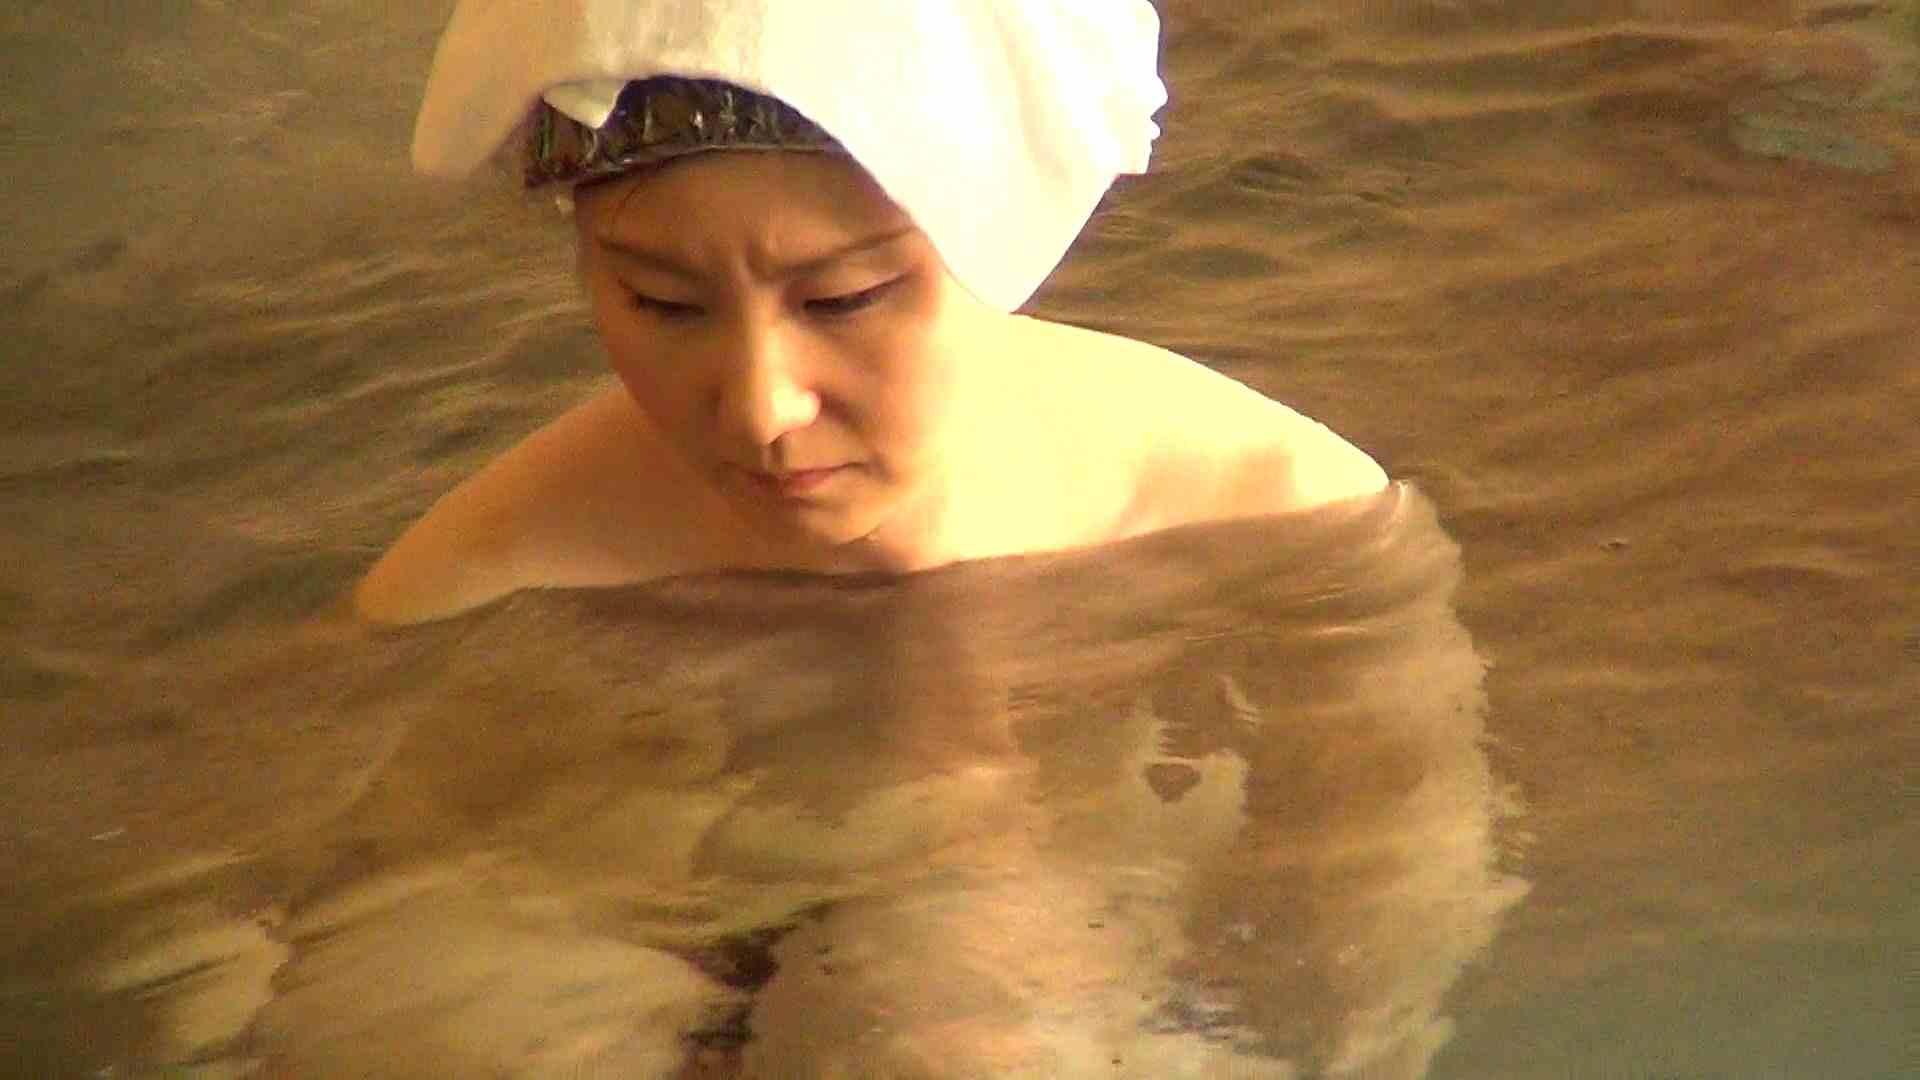 Vol.48 眉間にしわをよせた美人さん 裸体 オメコ動画キャプチャ 101連発 44